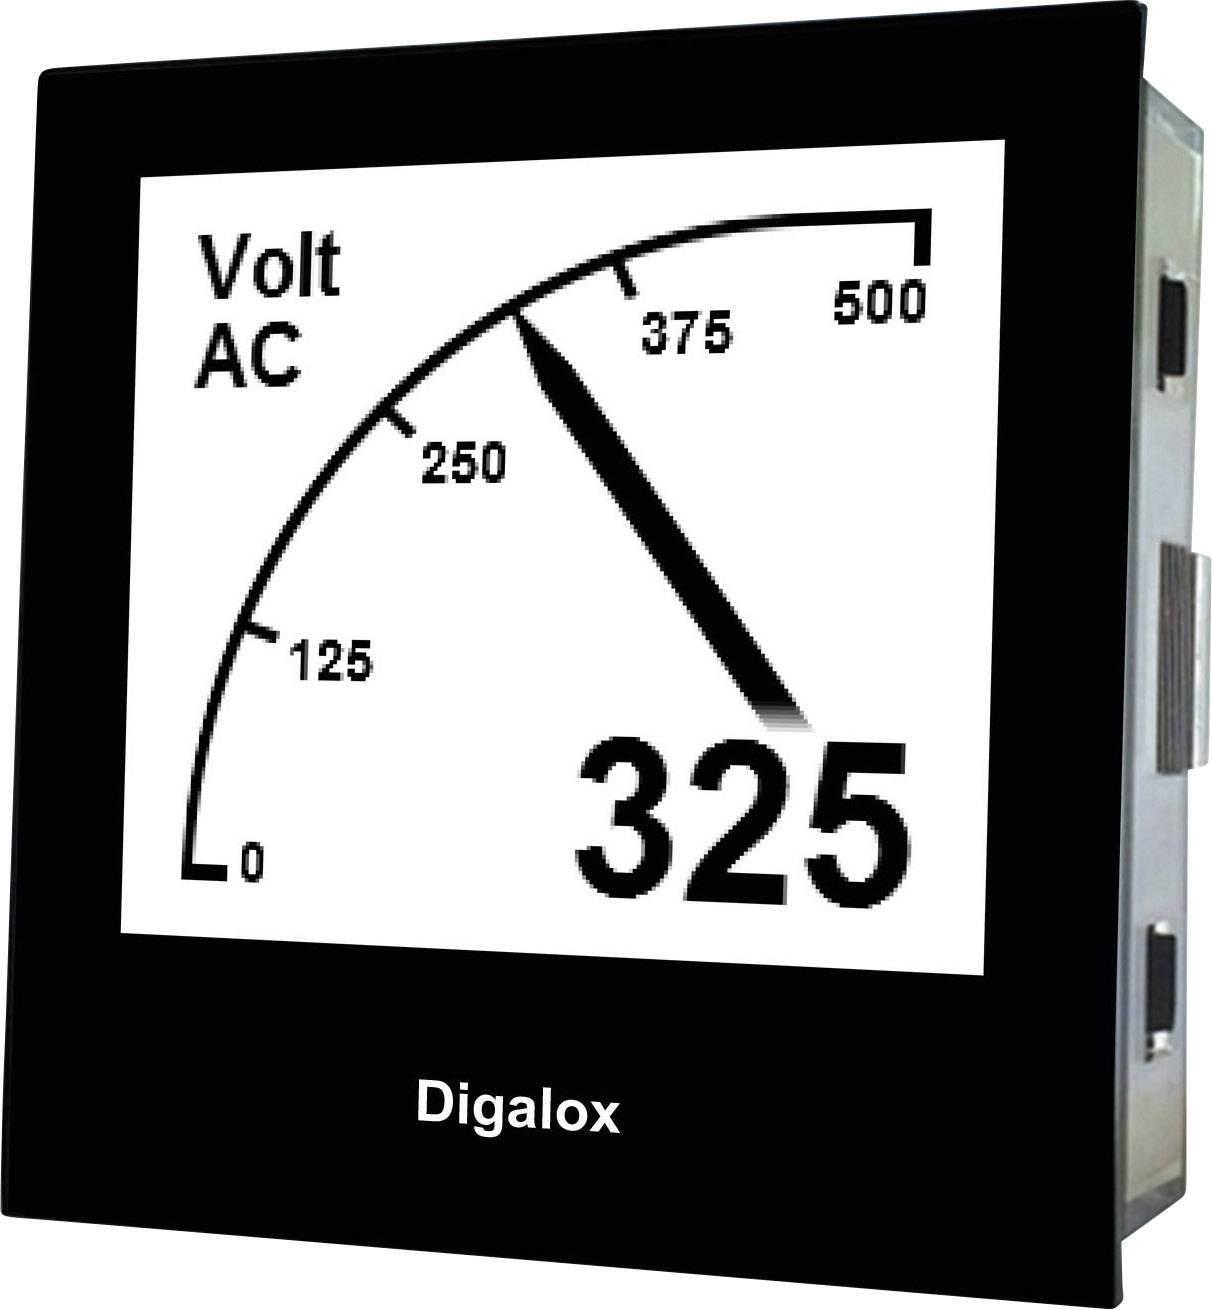 TDE Instruments Digalox DPM72-AV digitalni ugradbeni mjerni uređaj